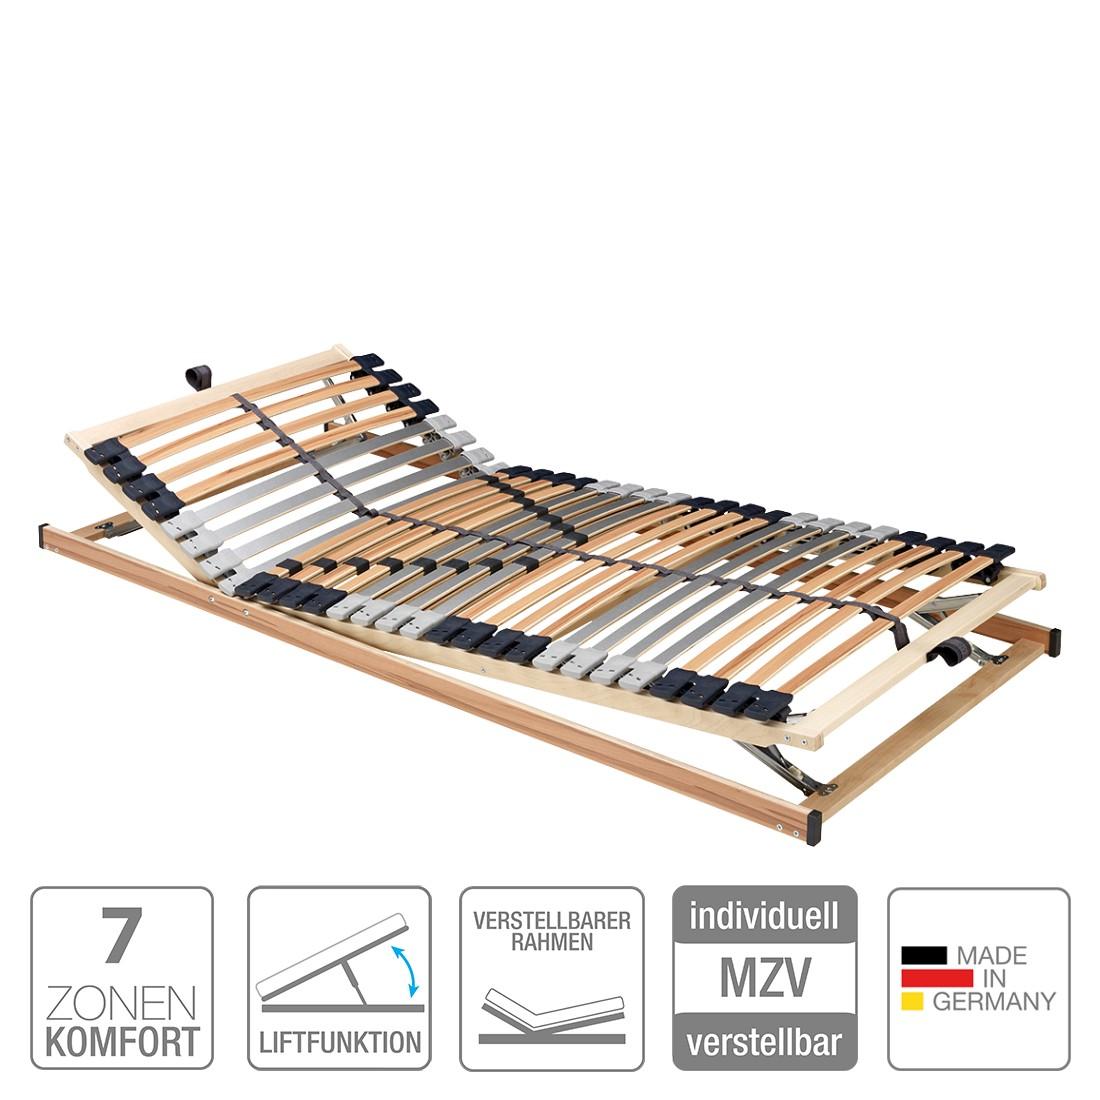 Lattenrost Prima (Gasdruckfeder, 7 Zonen) - verstellbar - 90 x 200 cm, Nova Dream Sleepline